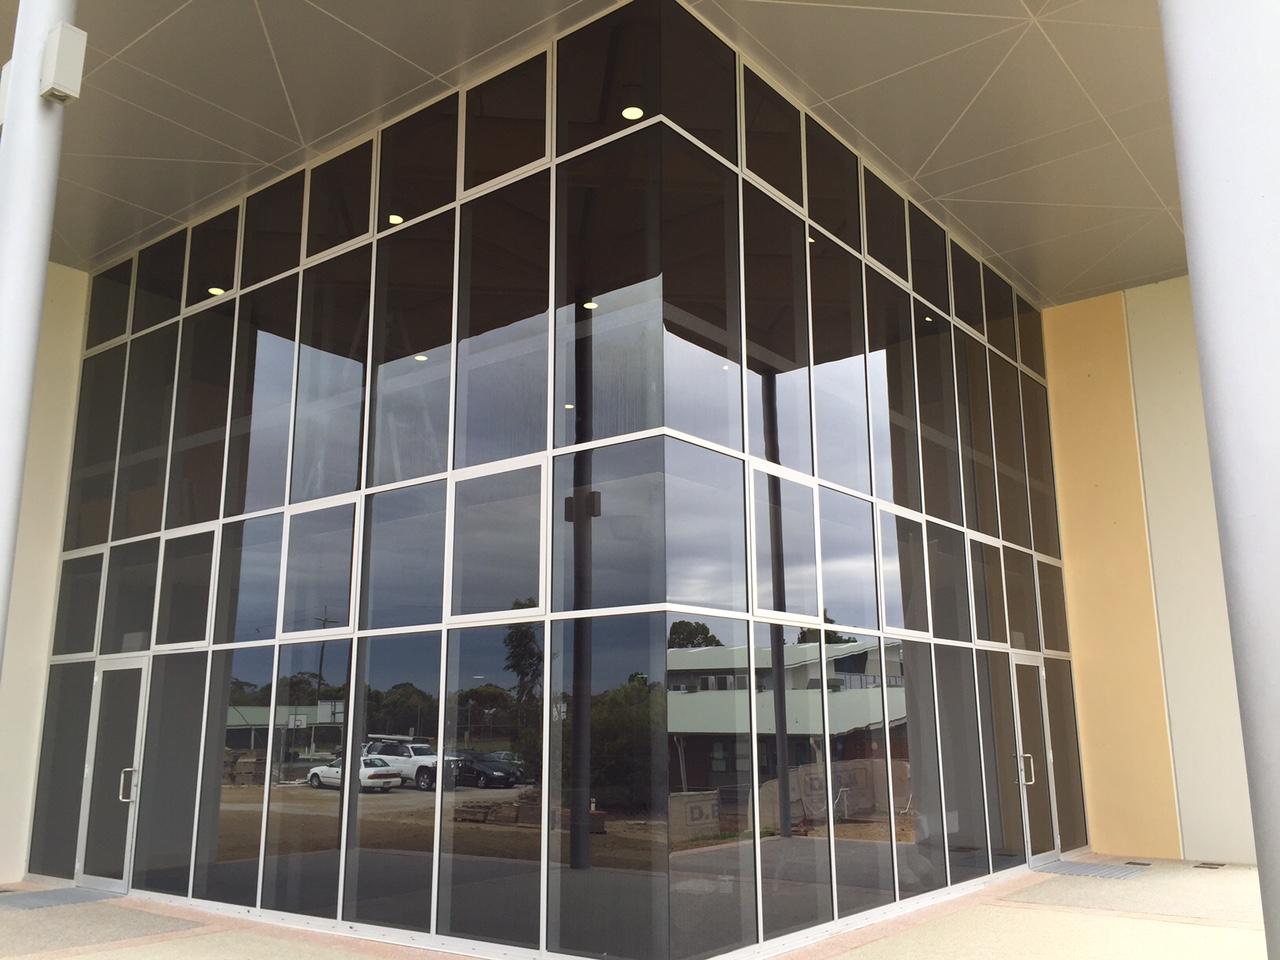 John Septimus School Mirrabooka – Exterior Glass Protection